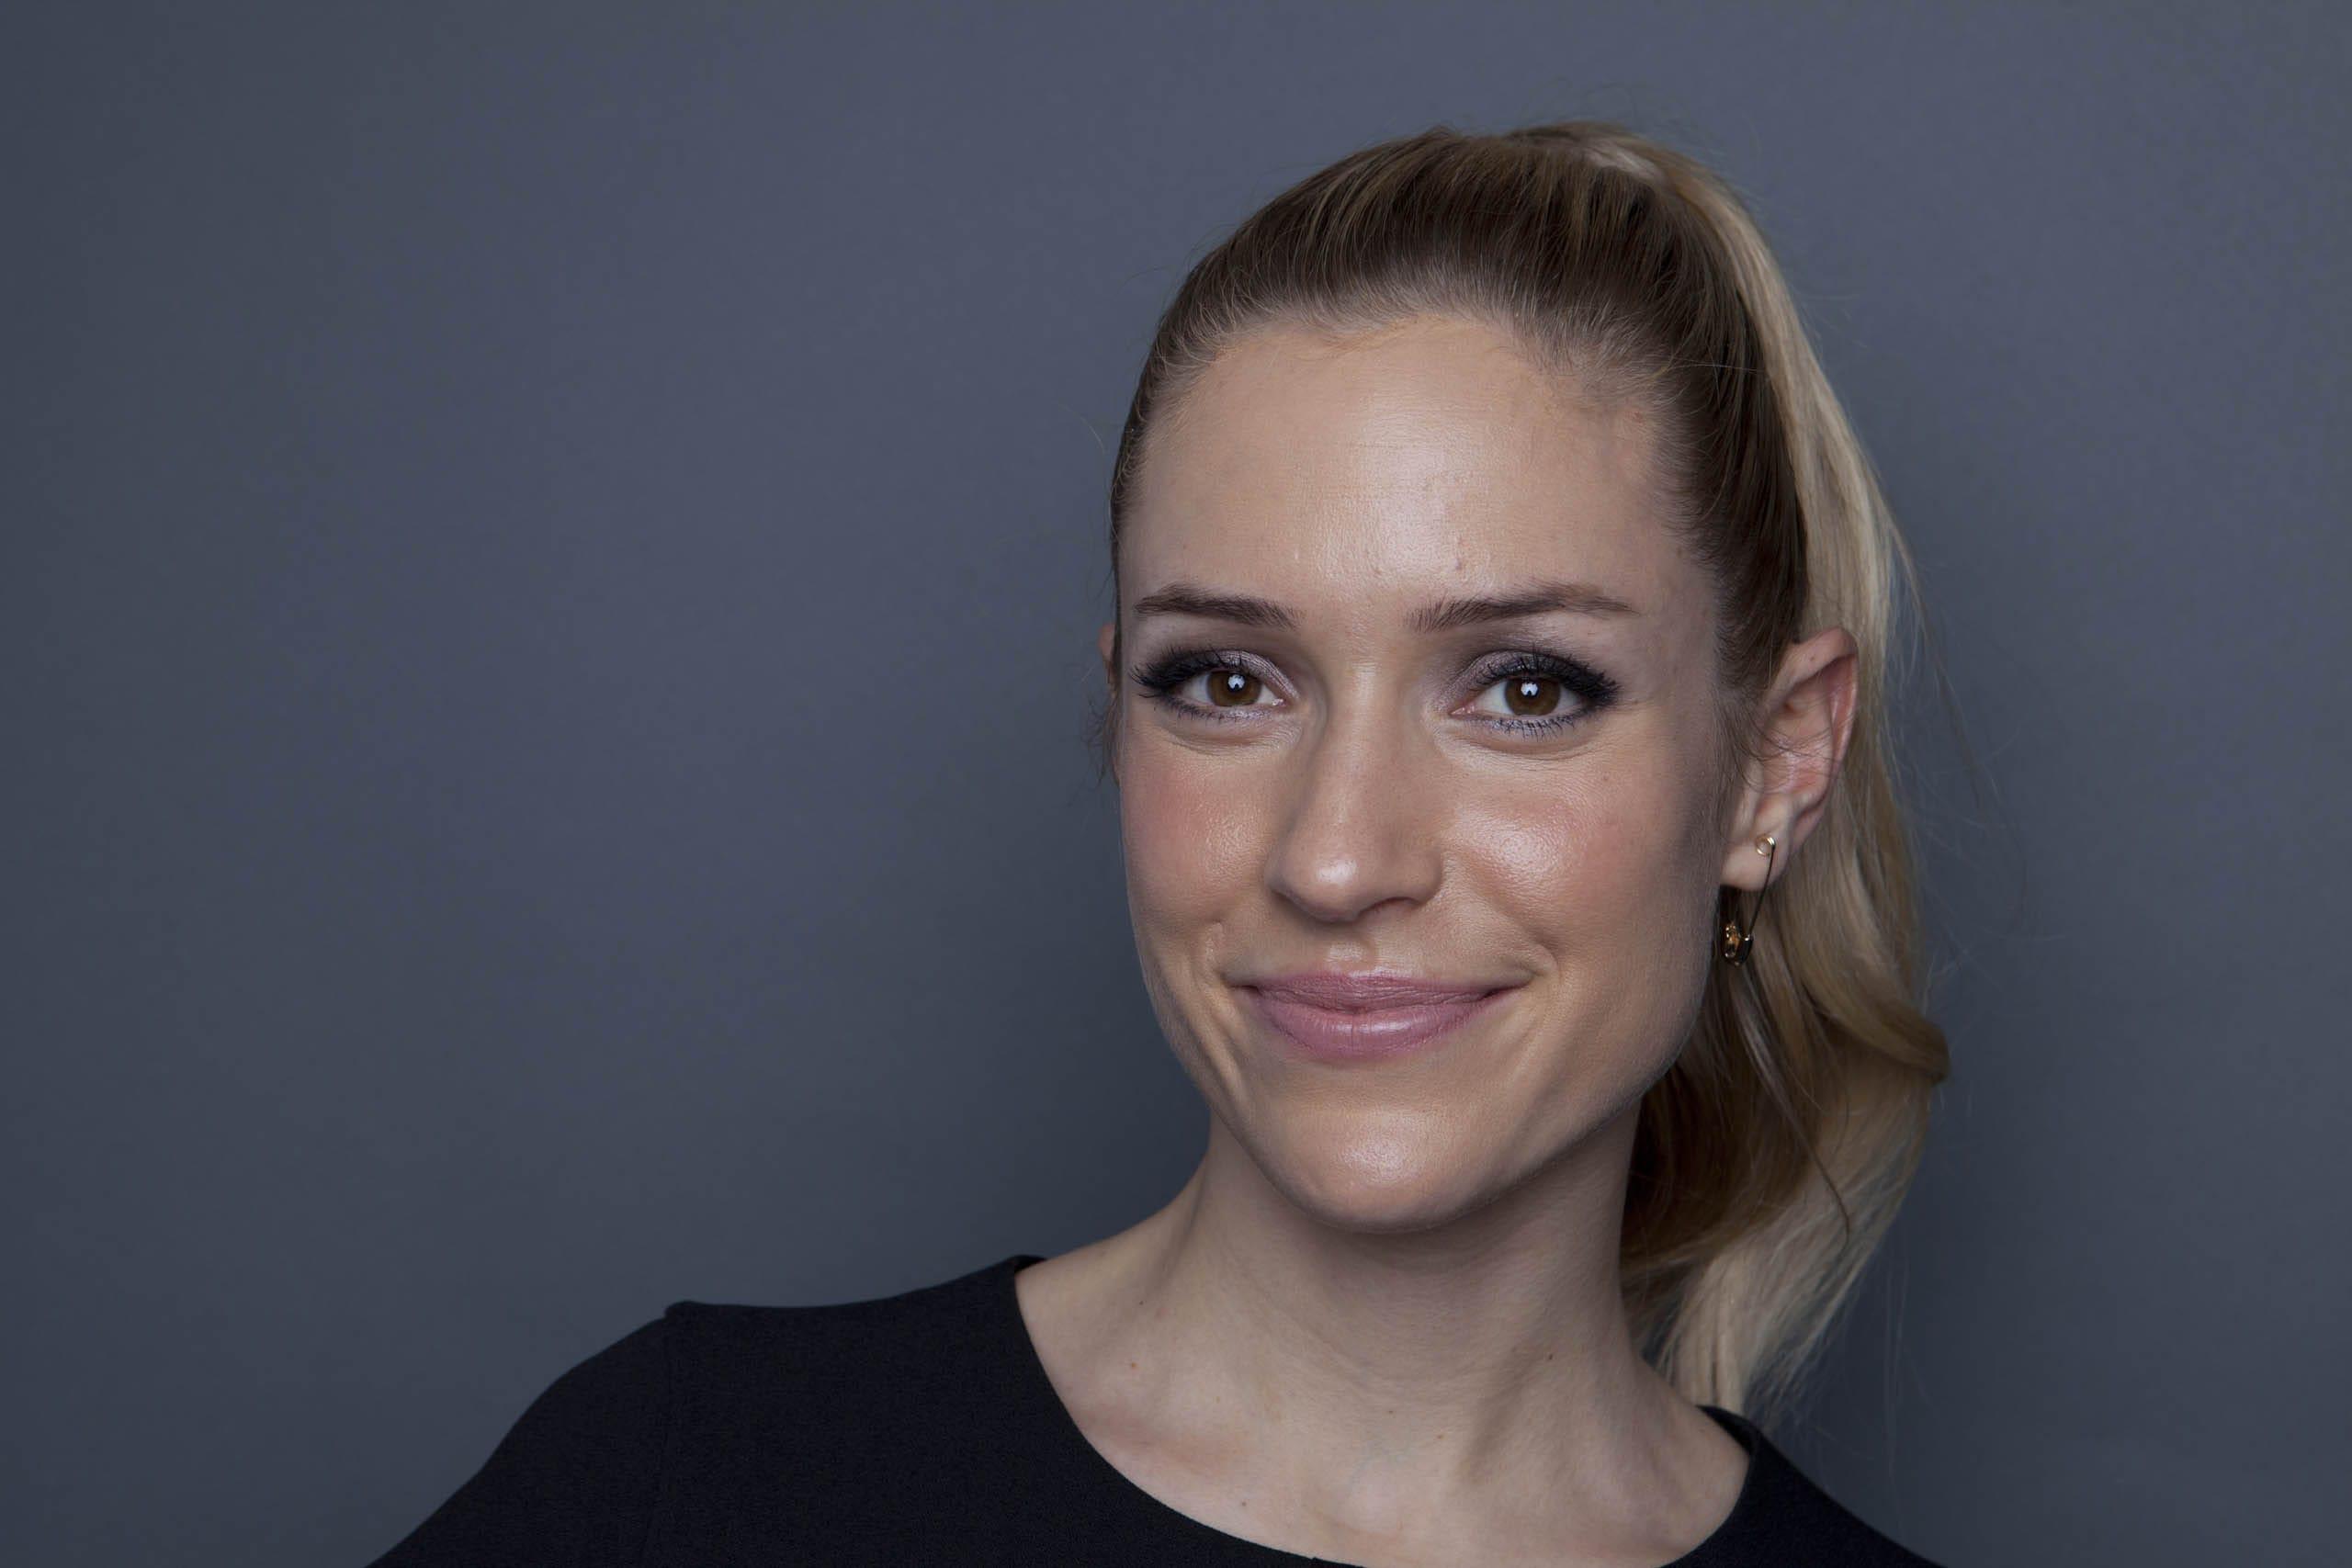 Kristin Cavallari Backgrounds